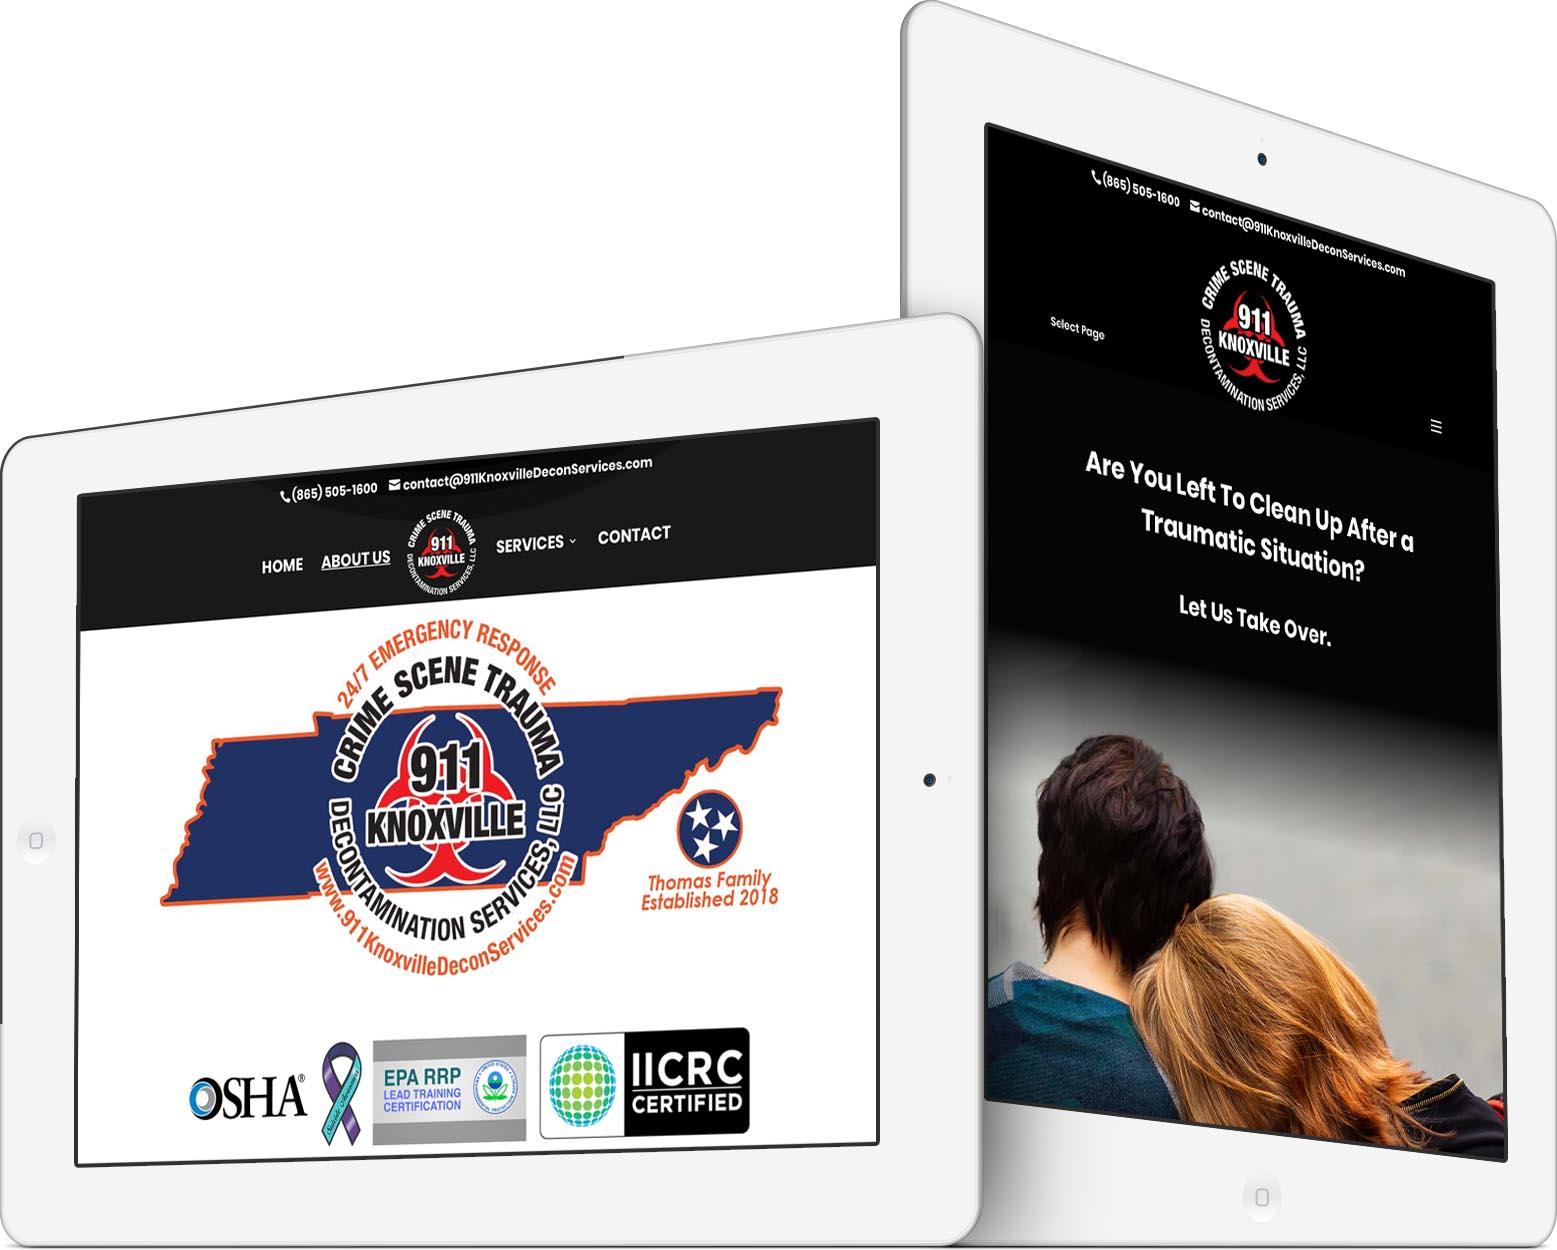 911 Decontamination Services Responsive Web Design